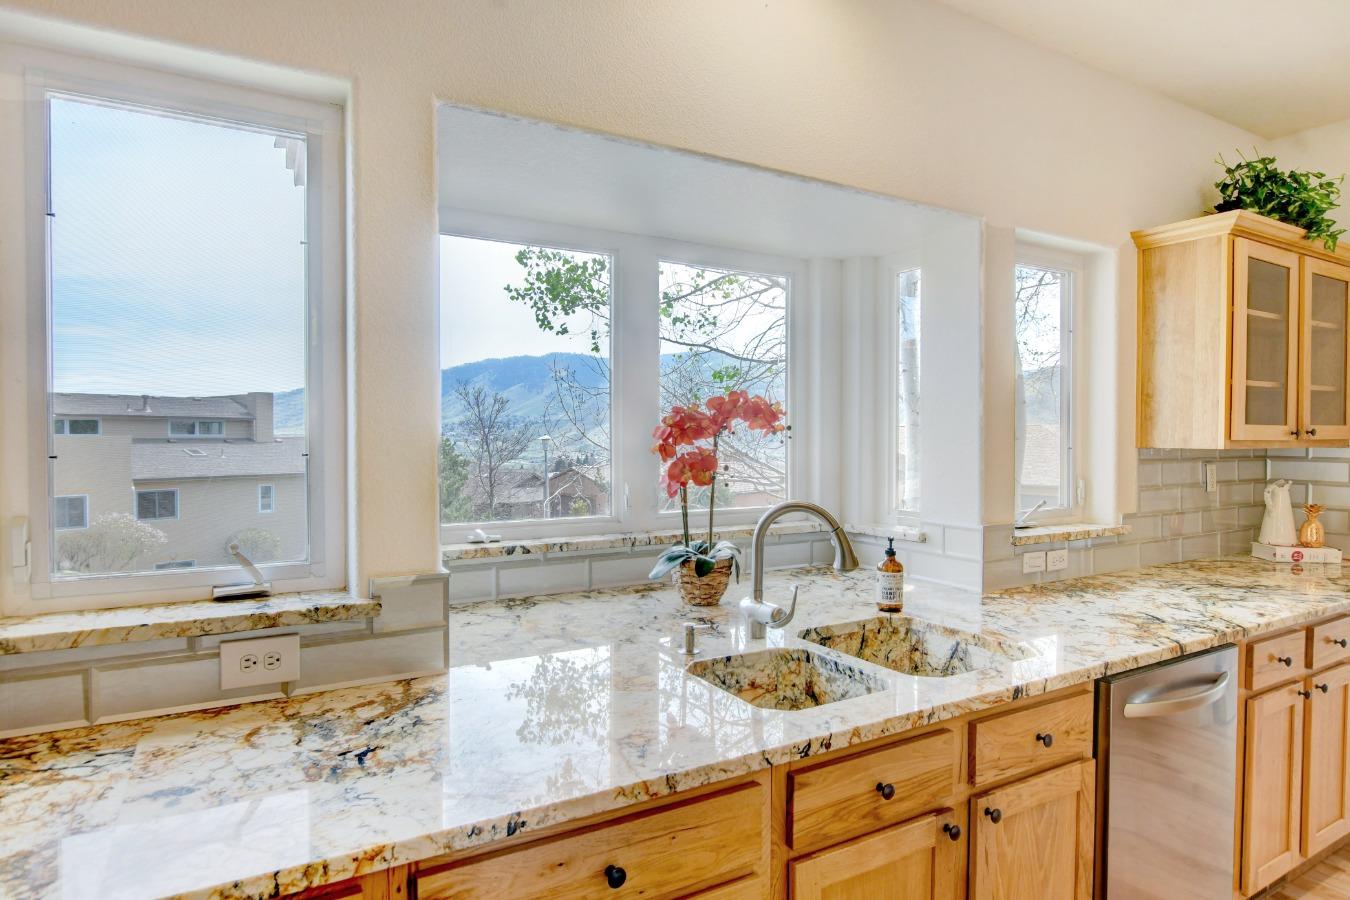 South Facing Kitchen Bay Window overlooks Golden